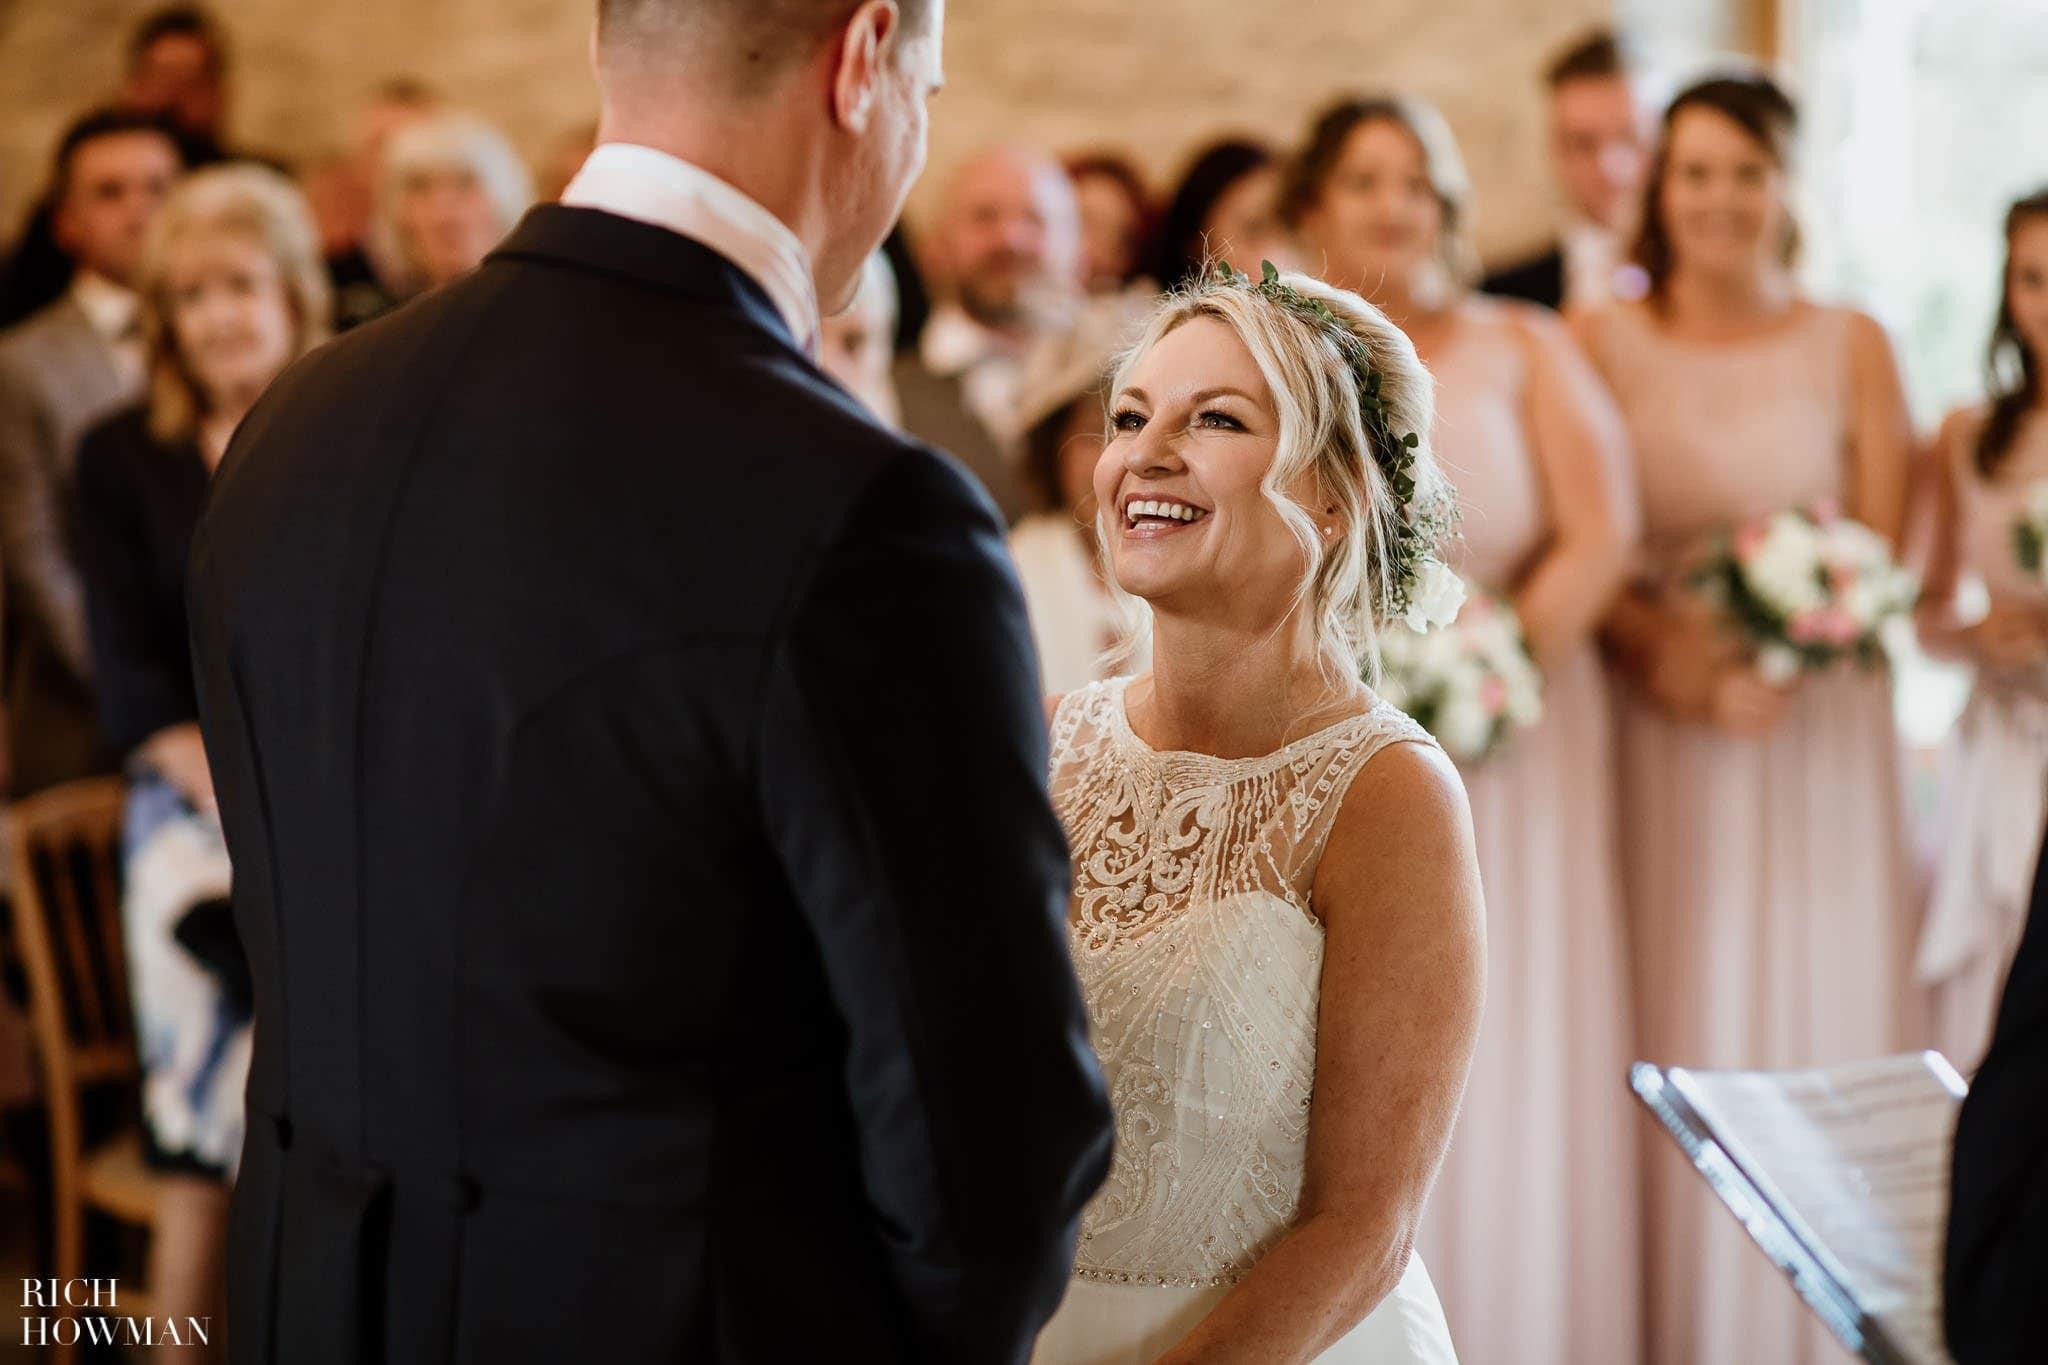 Kingscote Barn Wedding Photographer in Gloucestershire 542